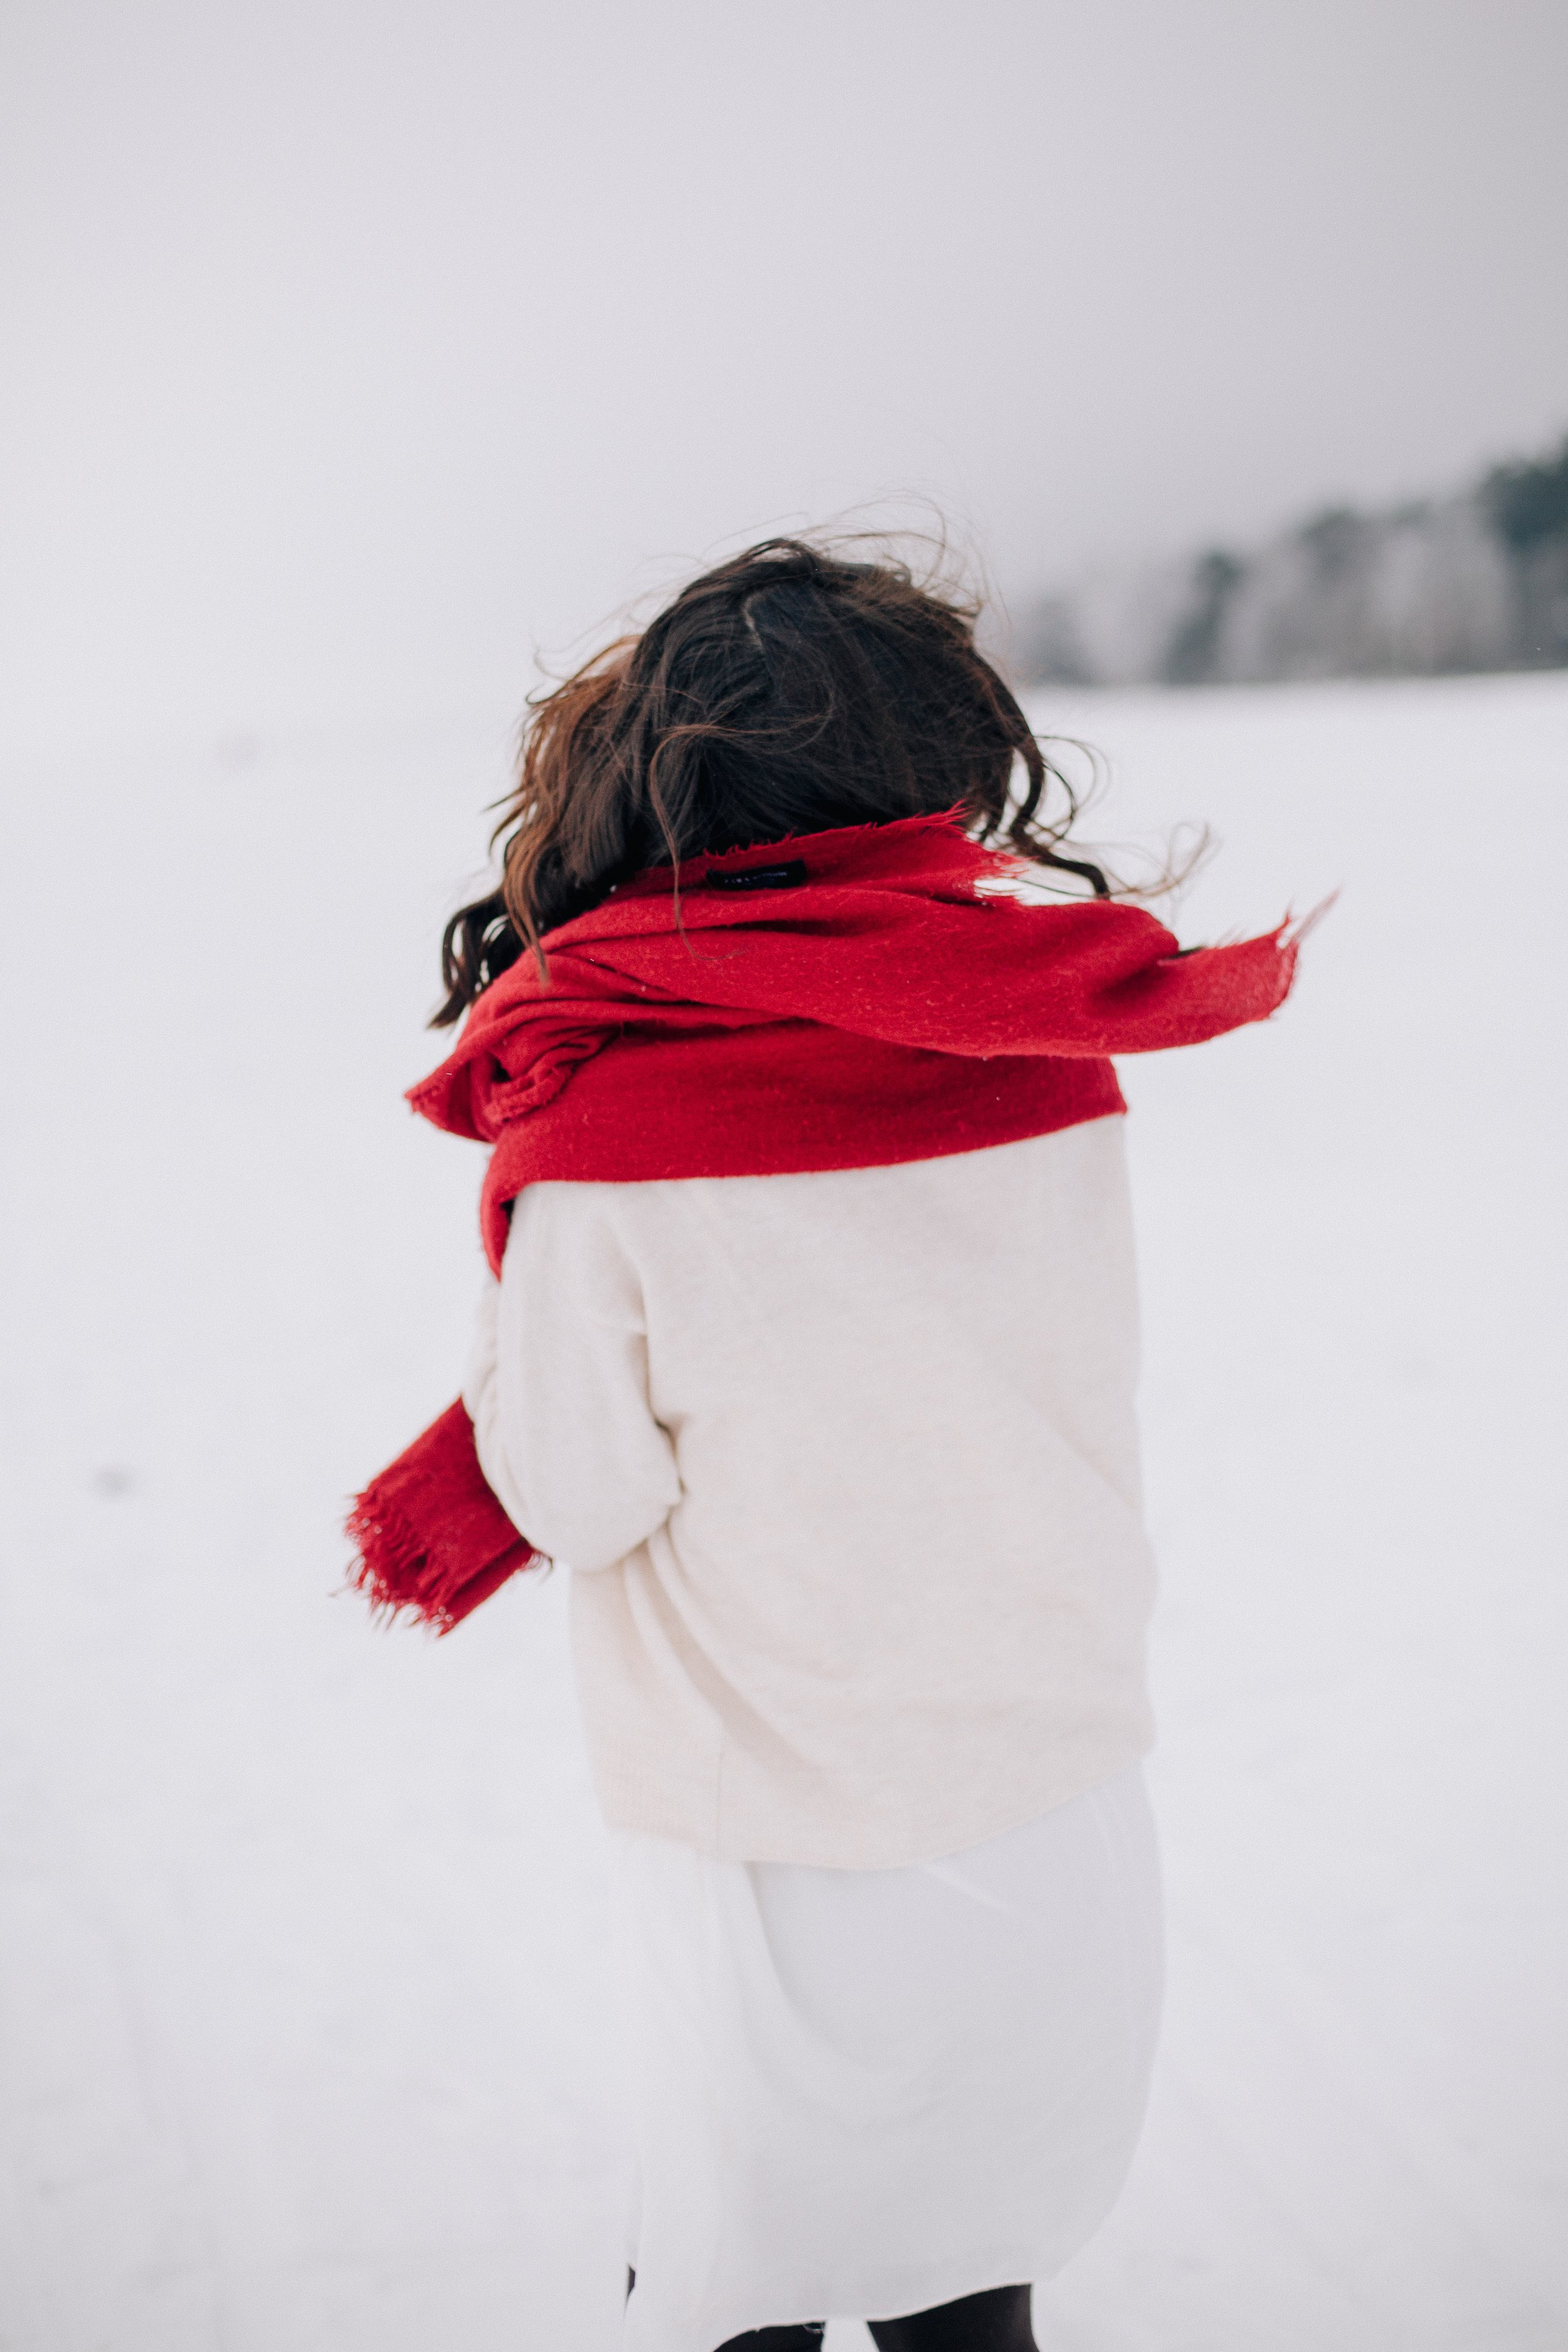 adult-cold-enjoyment-709797.jpg